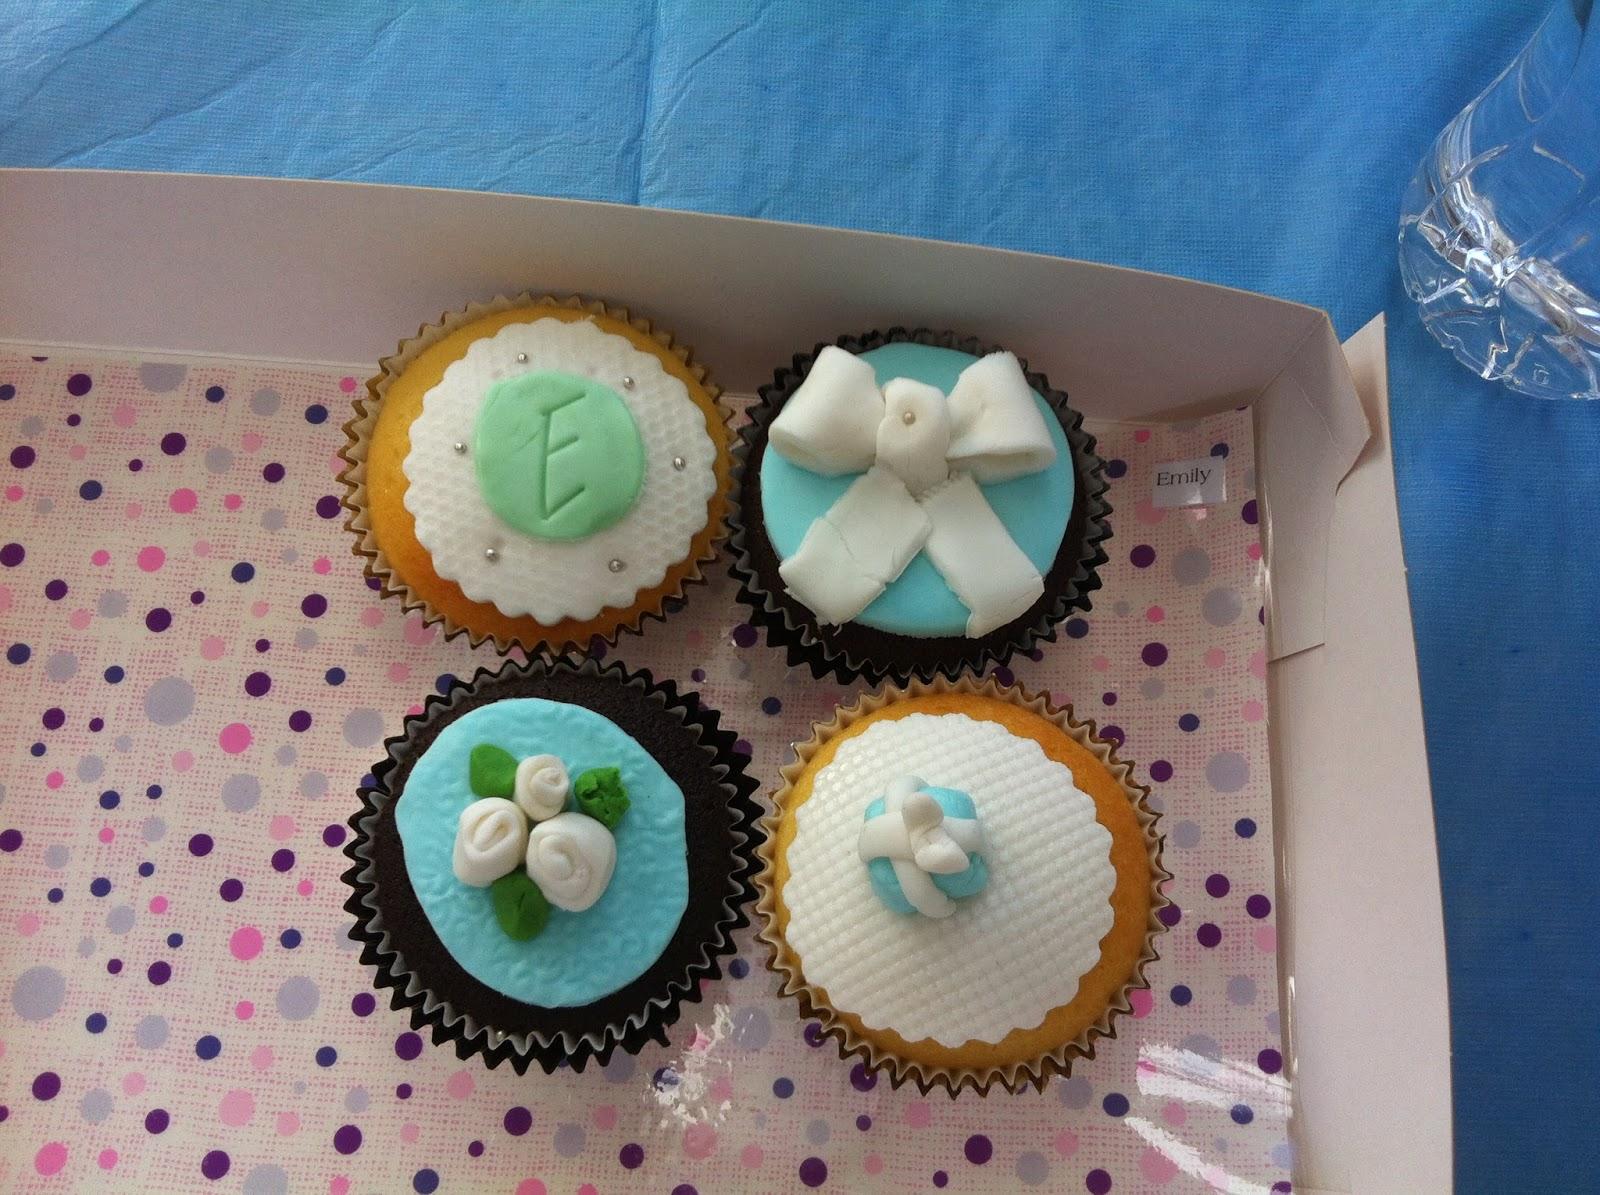 http://elegantcakesandpartydates.blogspot.com.au/2014/02/cupcake-decorating-parties.html